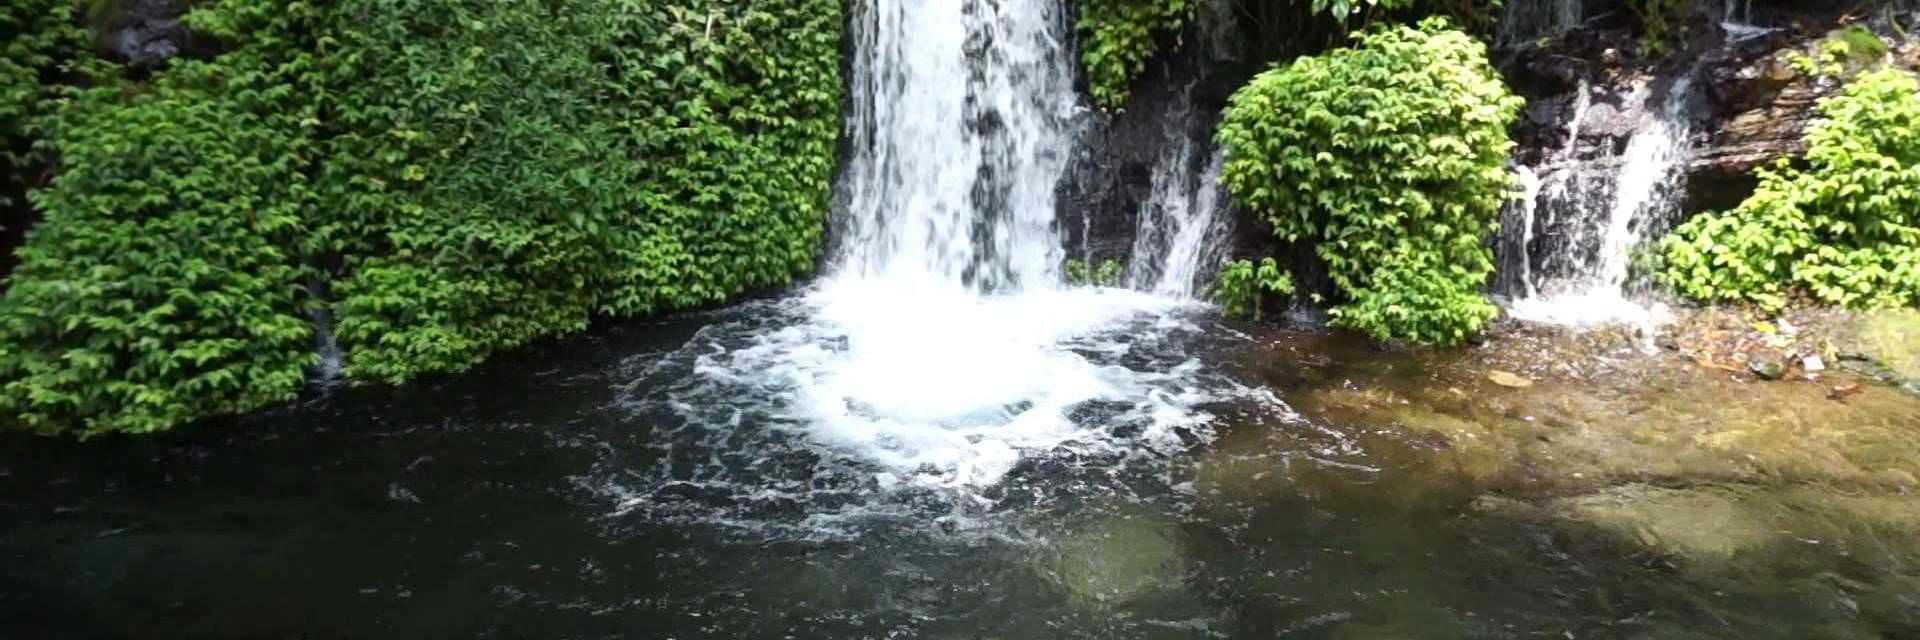 6 Wisata Sumber Air Terhits Malang 6 Wisata Sumber Air Terhits Malang - Dolan Dolen